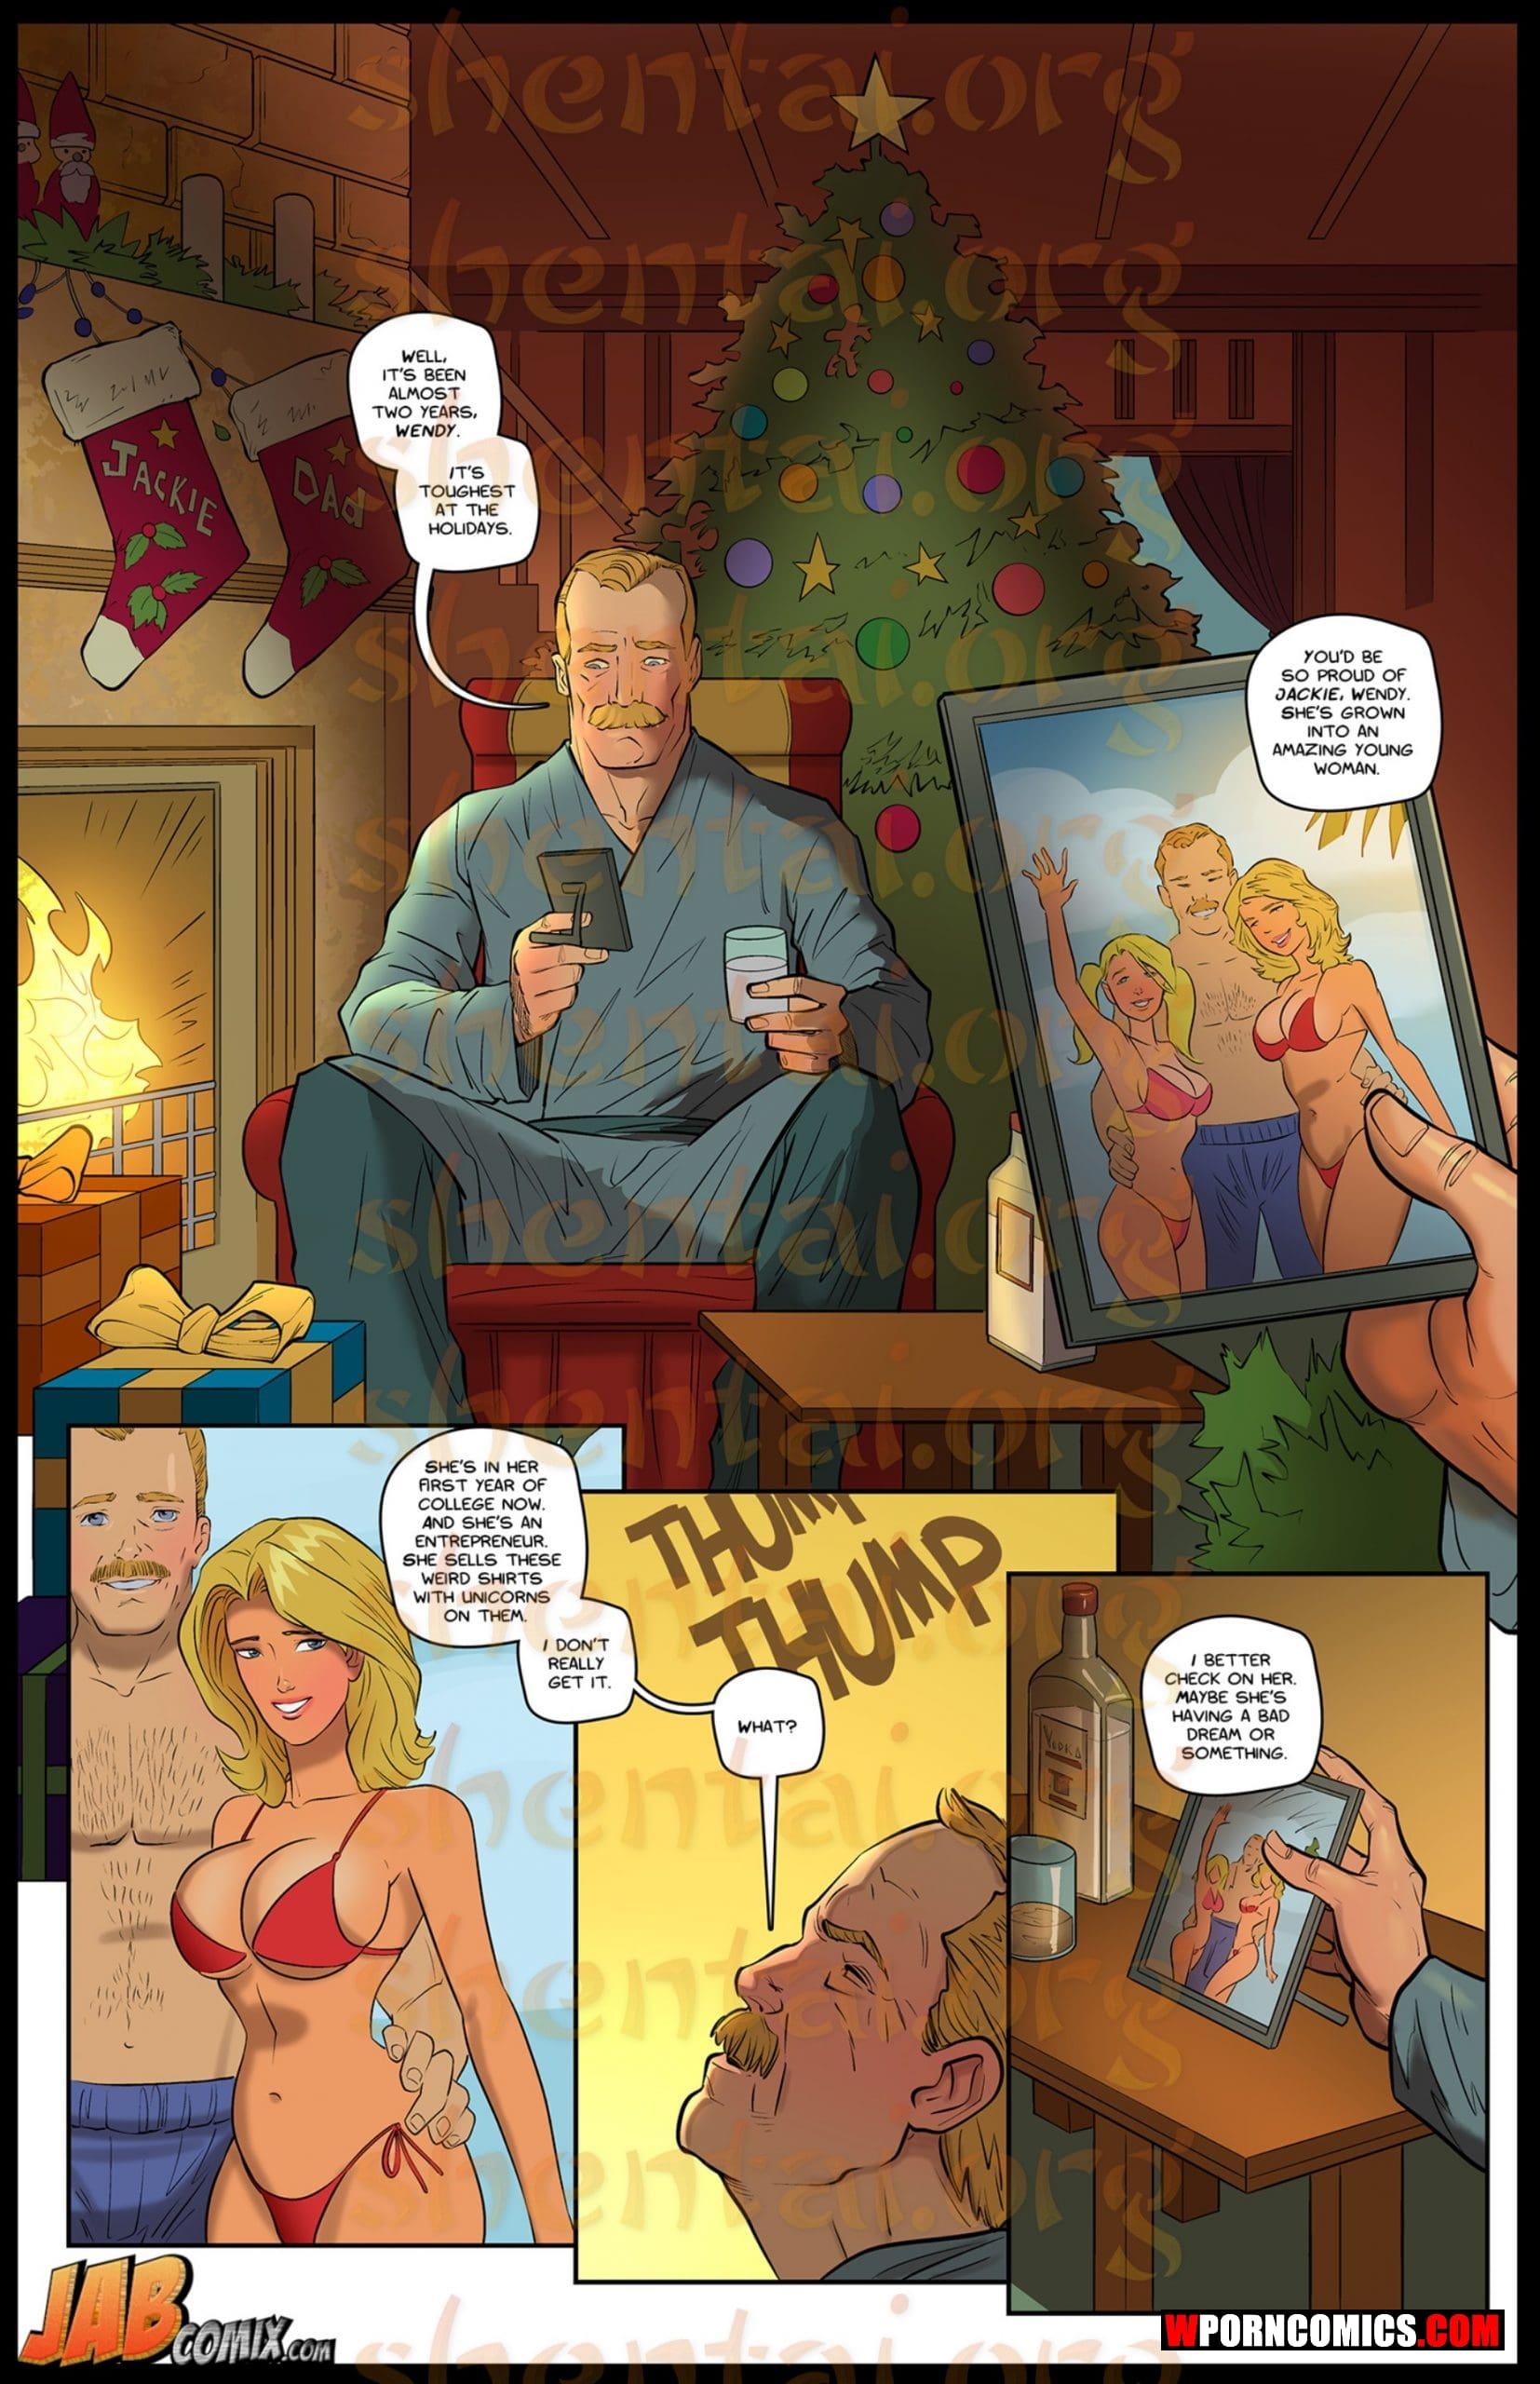 porn-comic-bubble-butt-princess-2020-01-26/porn-comic-bubble-butt-princess-2020-01-26-22872.jpg